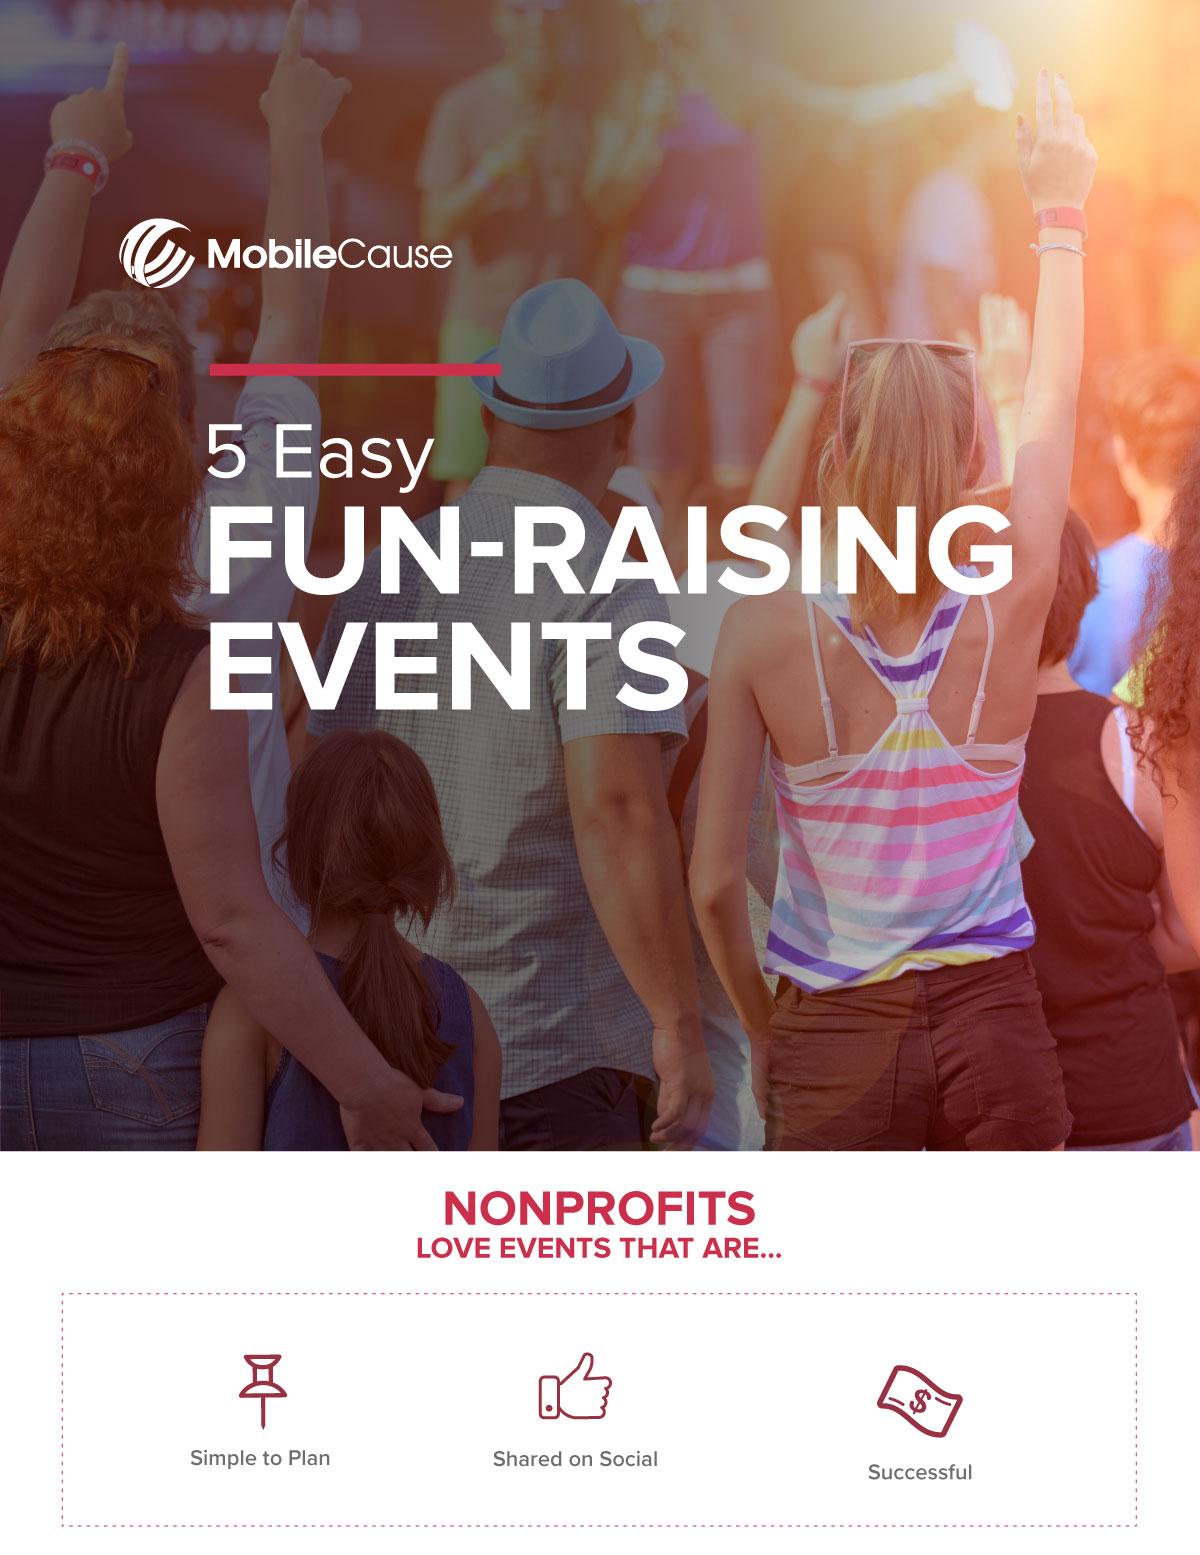 5_EasyandEngaging_EventIdeas_Infographic.jpg